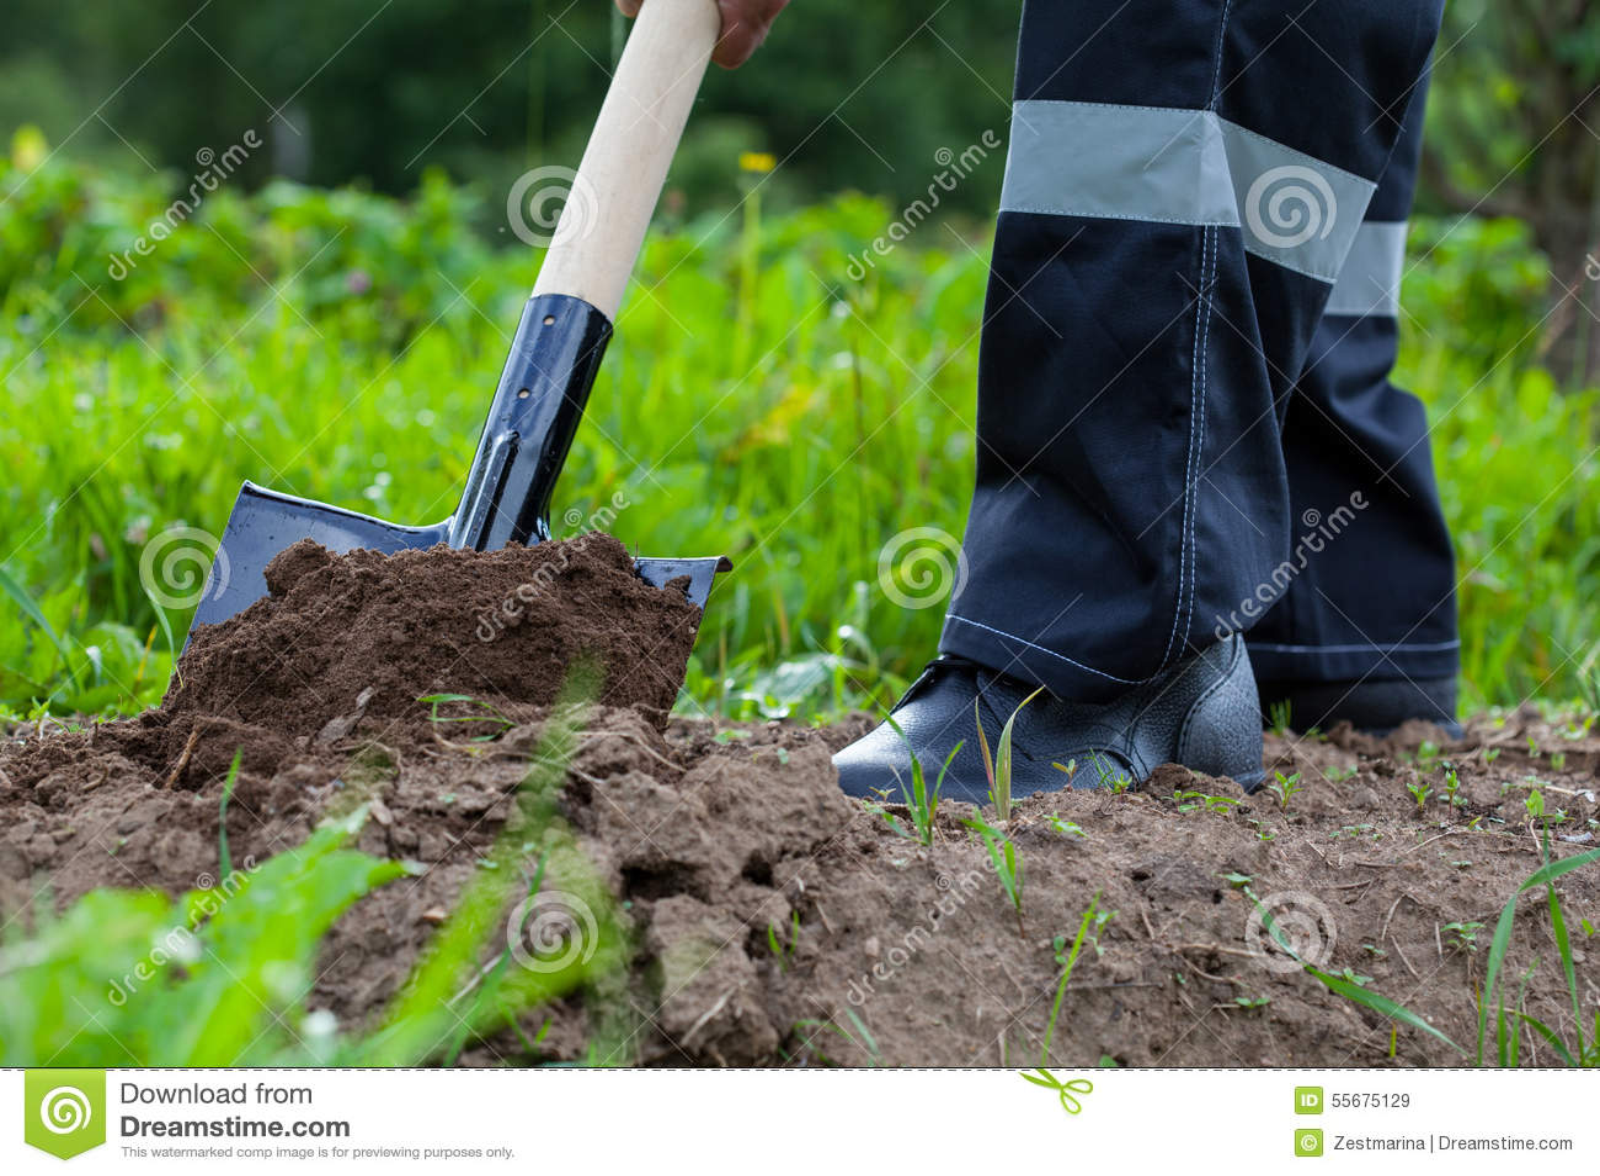 agriculteur creusant un jardin image stock image du. Black Bedroom Furniture Sets. Home Design Ideas